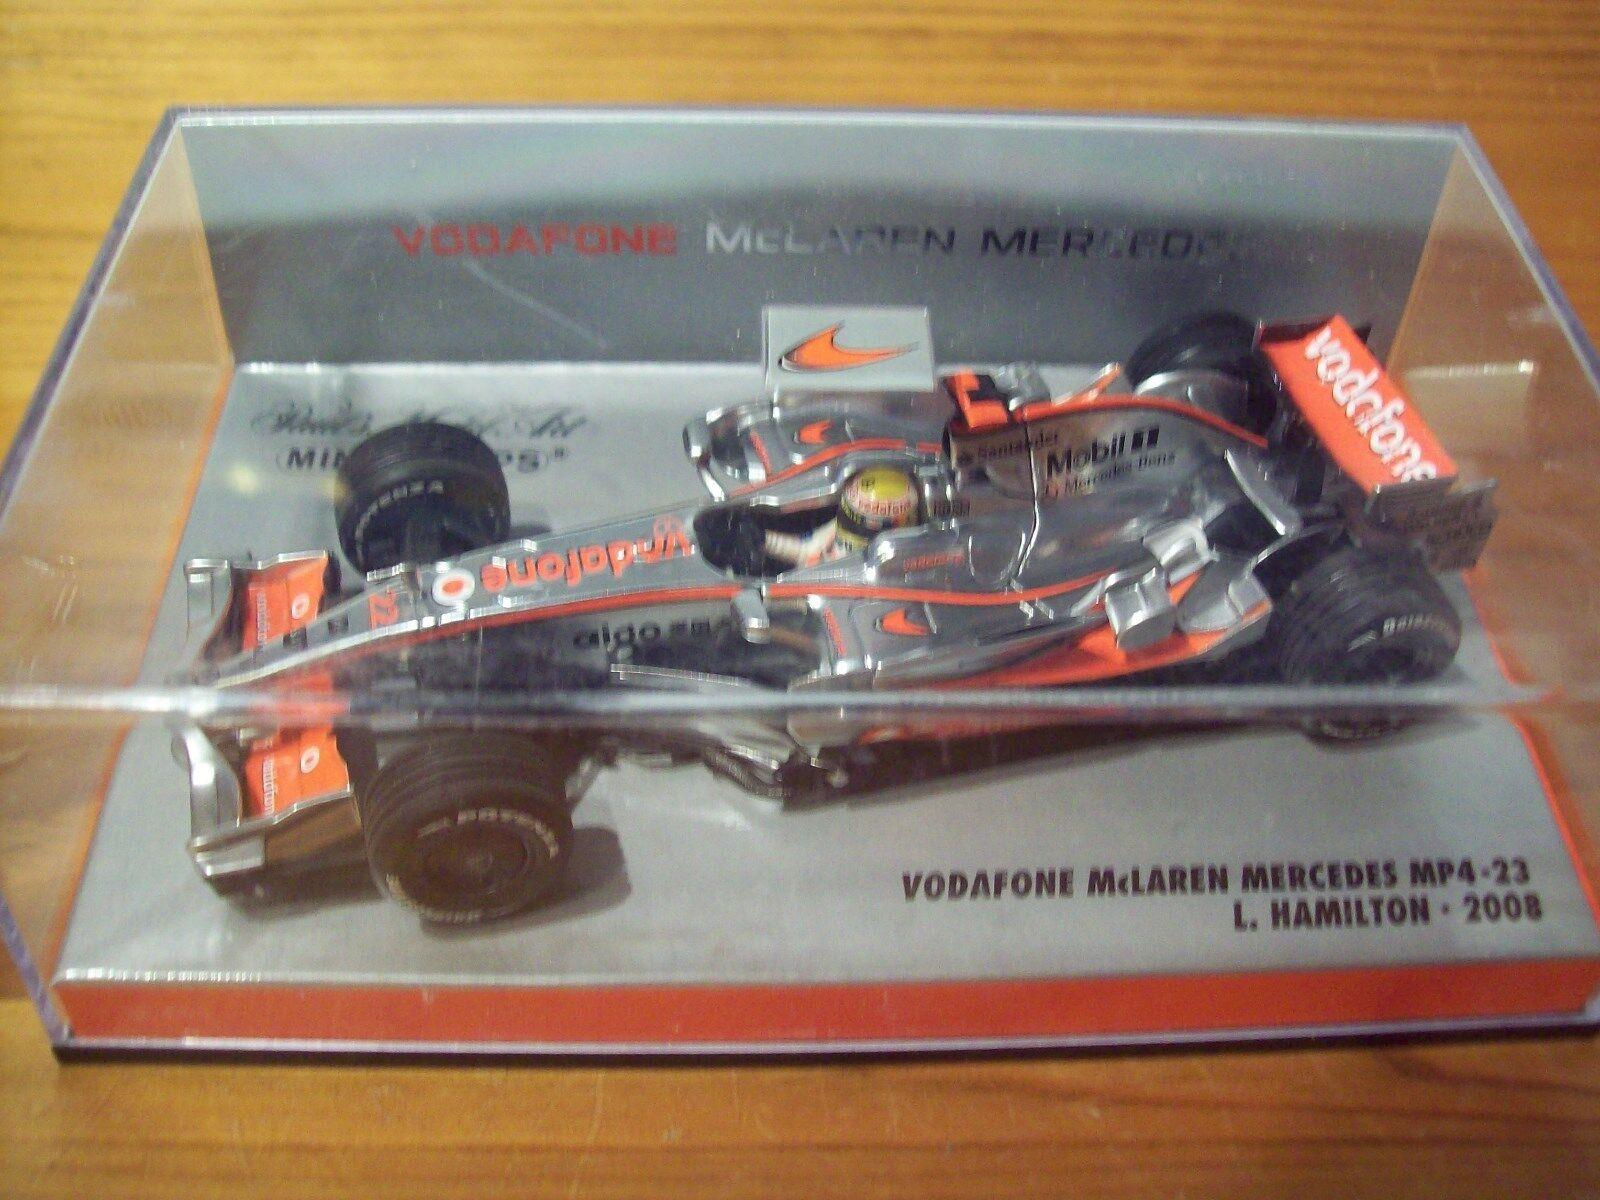 1/43 2008 McLaren MP4/23 Lewis Hamilton Vodaphone BOX 2008 CAMPIONE DEL MONDO